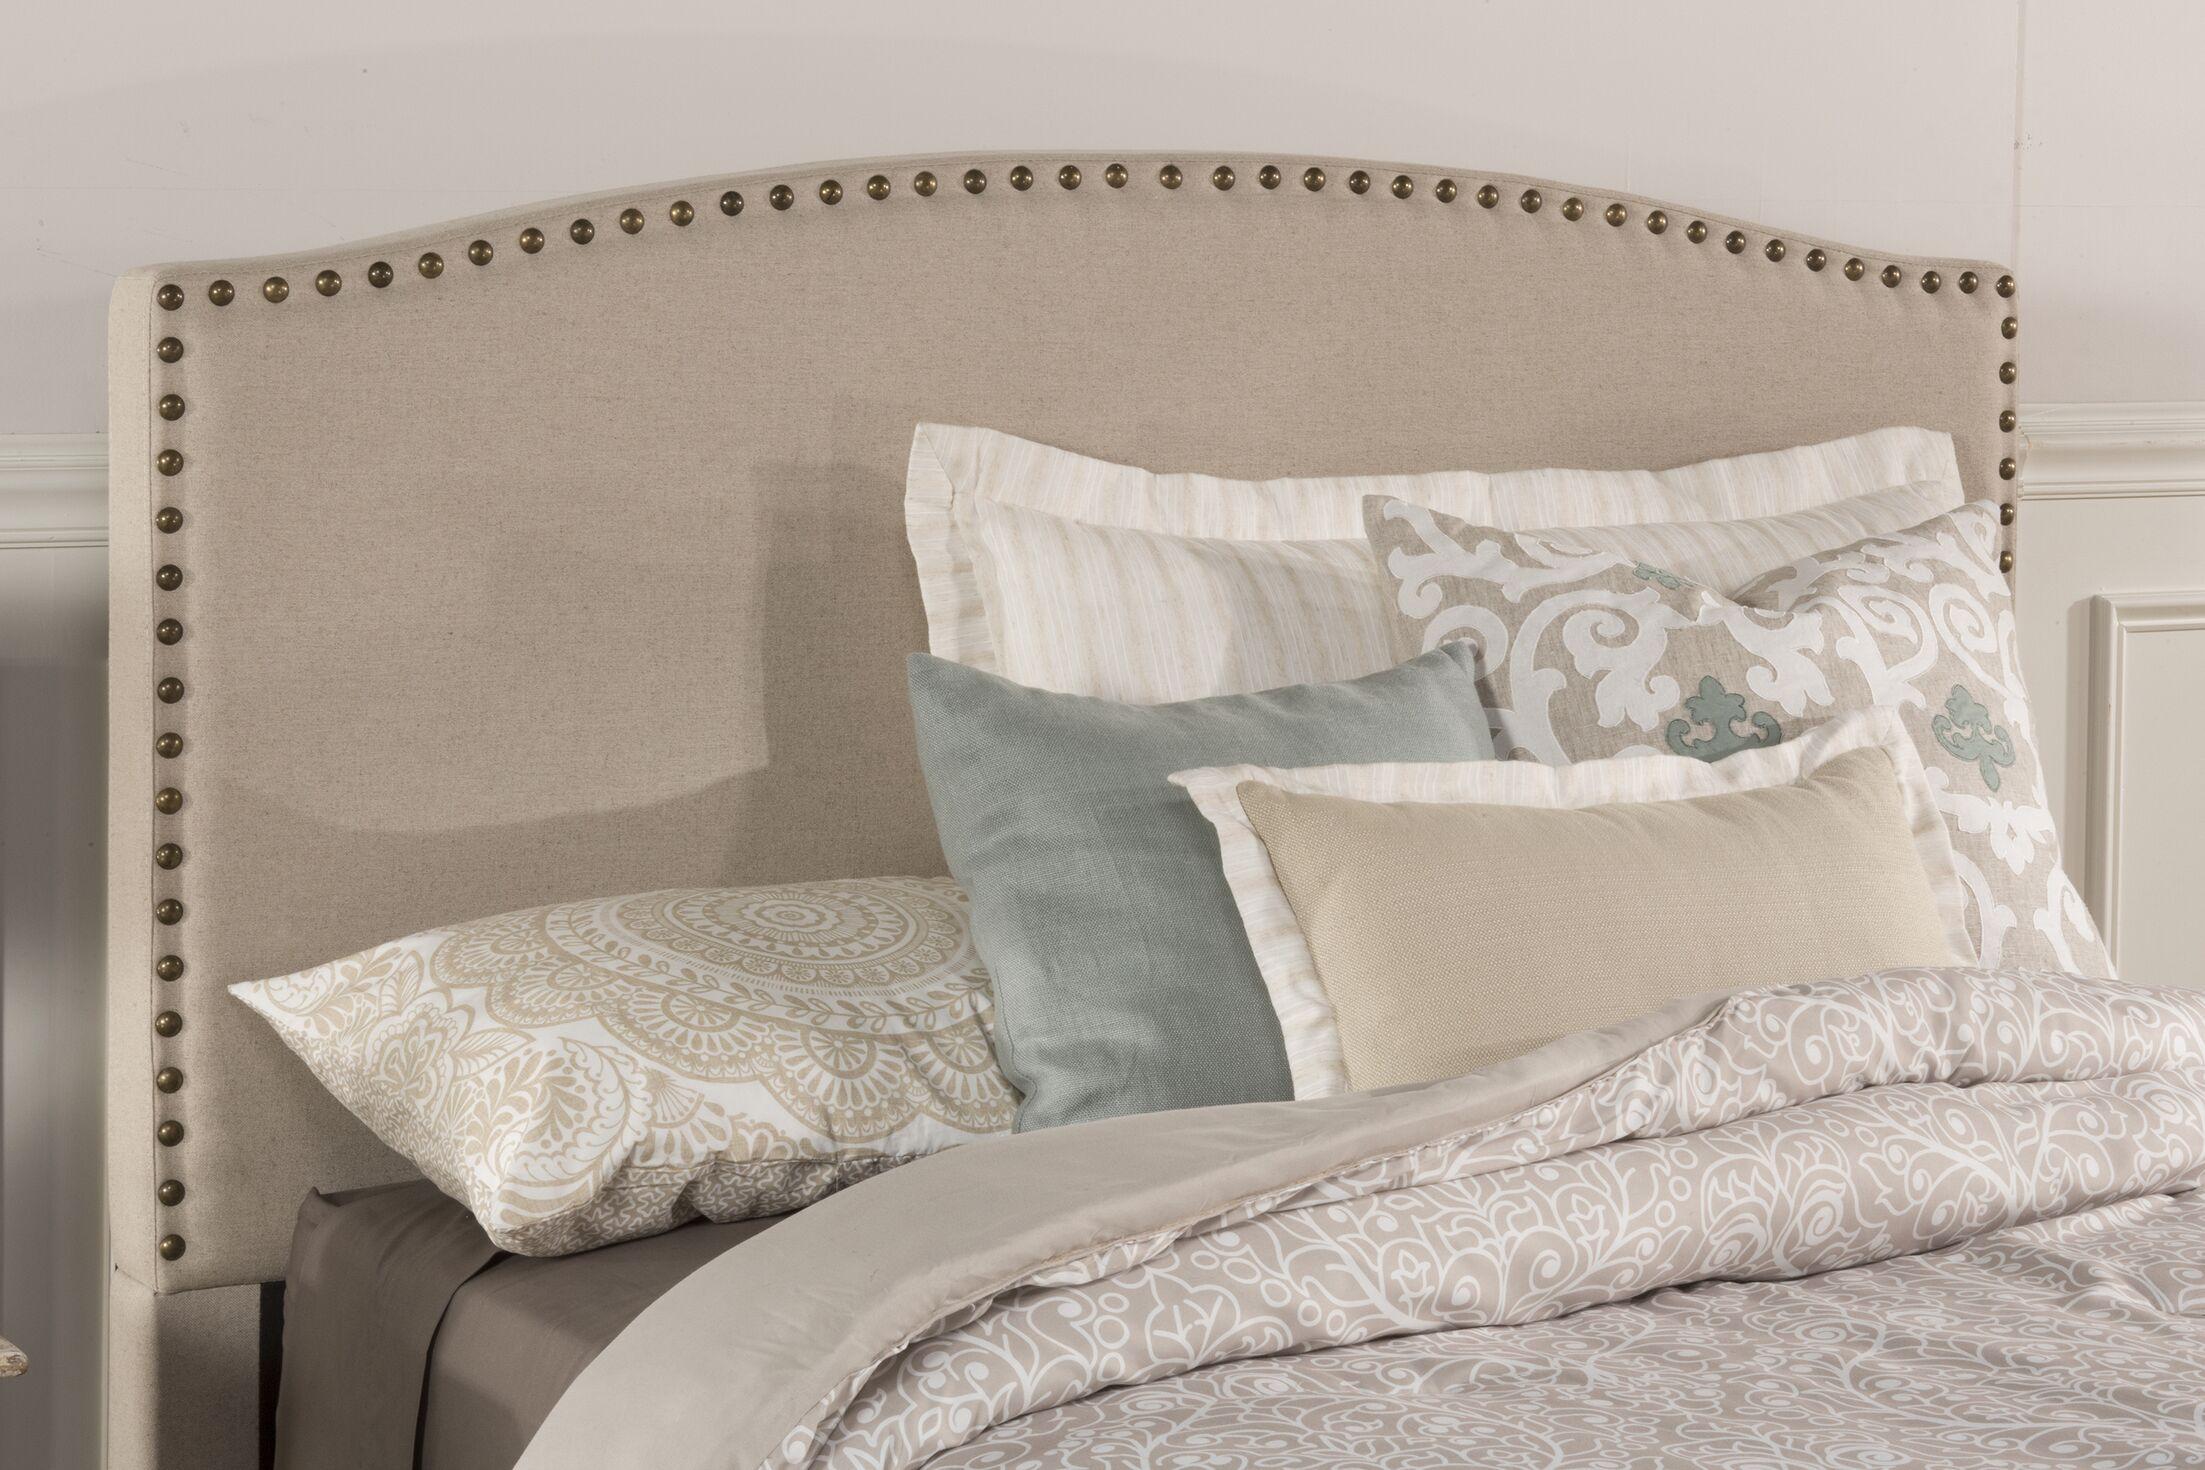 Granger Upholstered Panel Headboard Size: Twin, Upholstery: Light Taupe